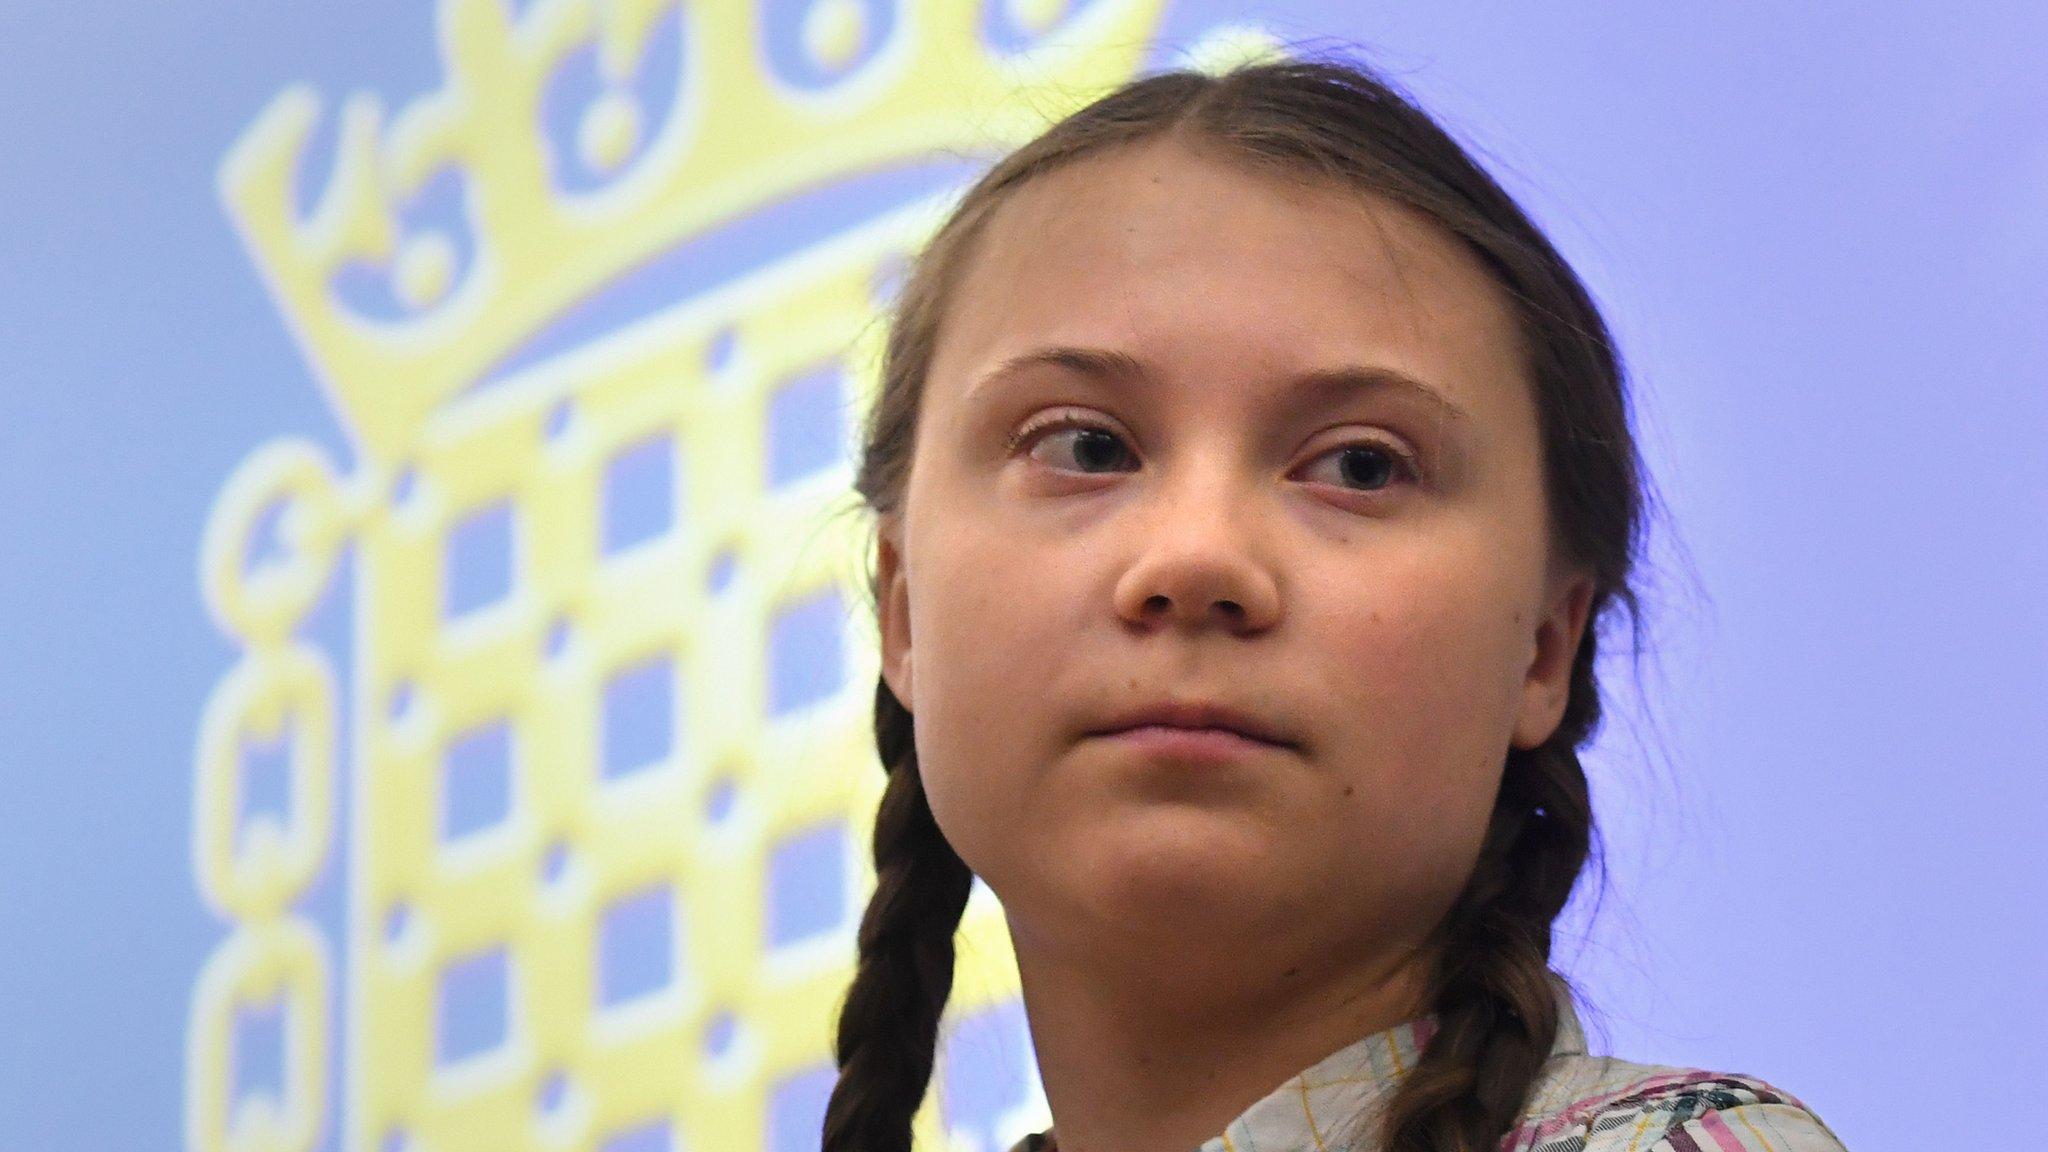 Greta Thunberg: Teen activist says UK is 'irresponsible' on climate